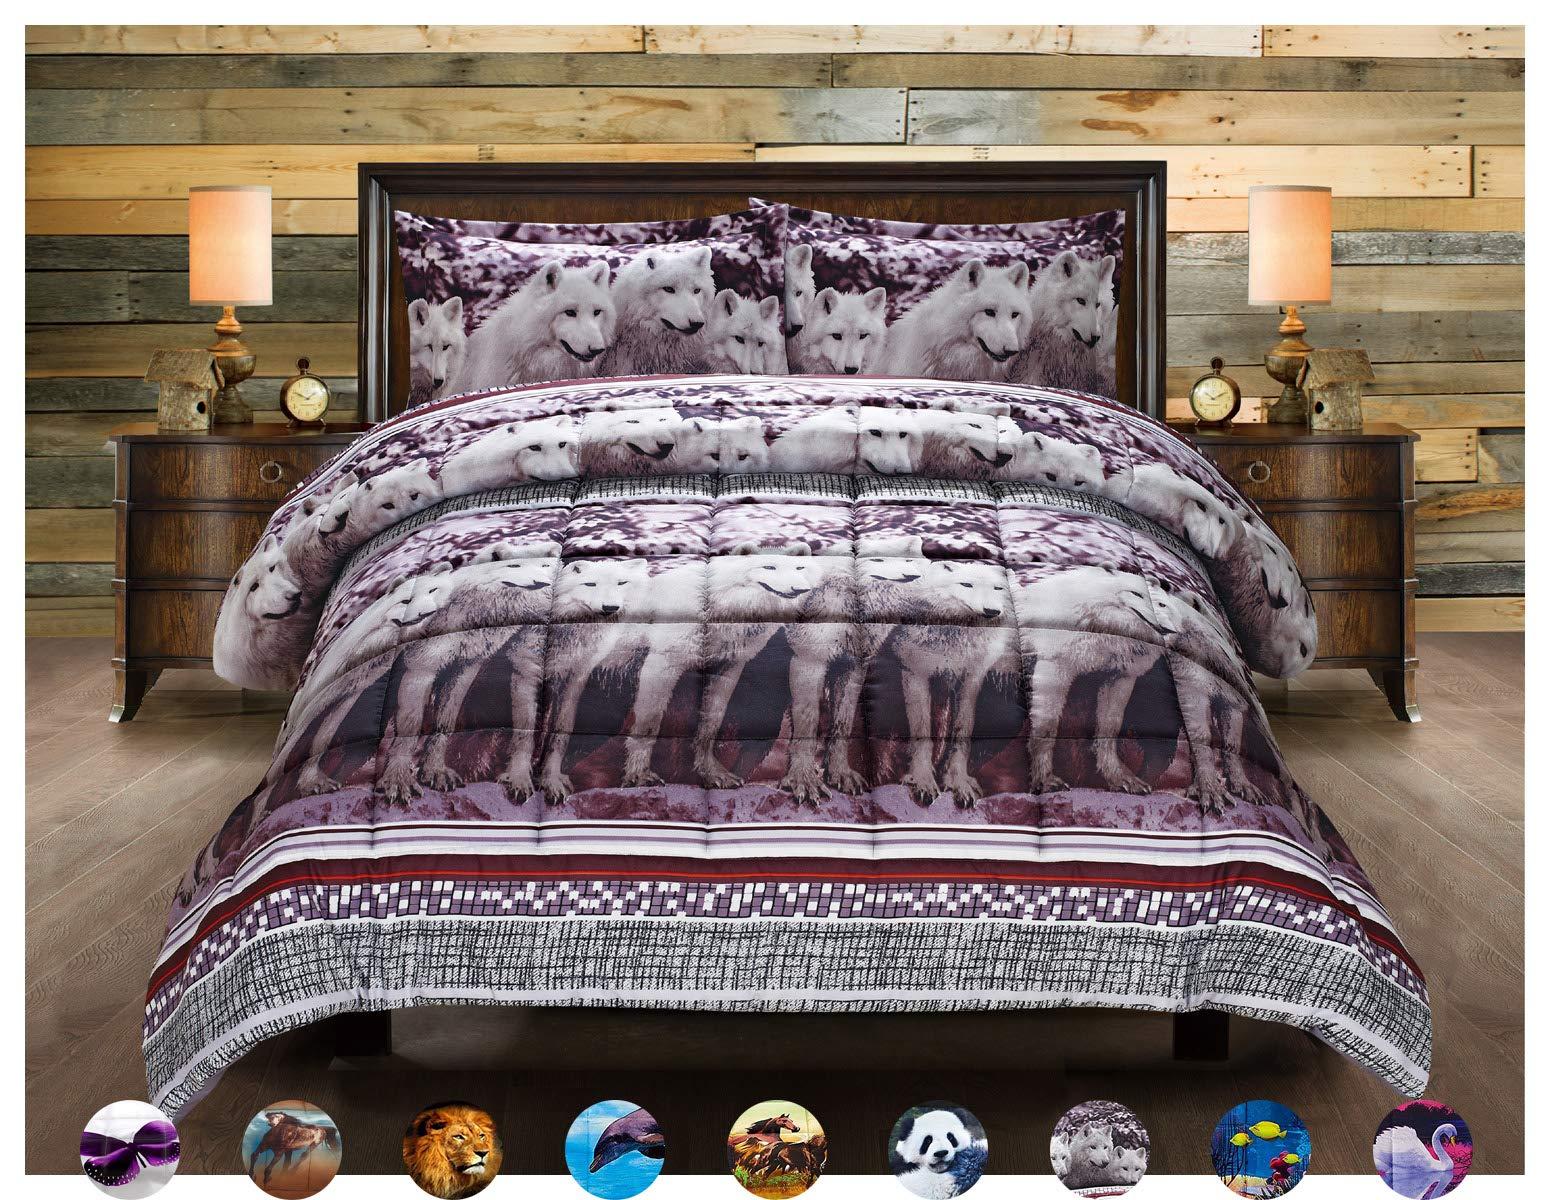 HUAJIE 3 Piece Set Beautiful Soft 3d Print Vivid Animals Pattern Box Stitched Comforter Set (1 Comforter,2 Pillowcase) (Queen, Mountain Wolf)